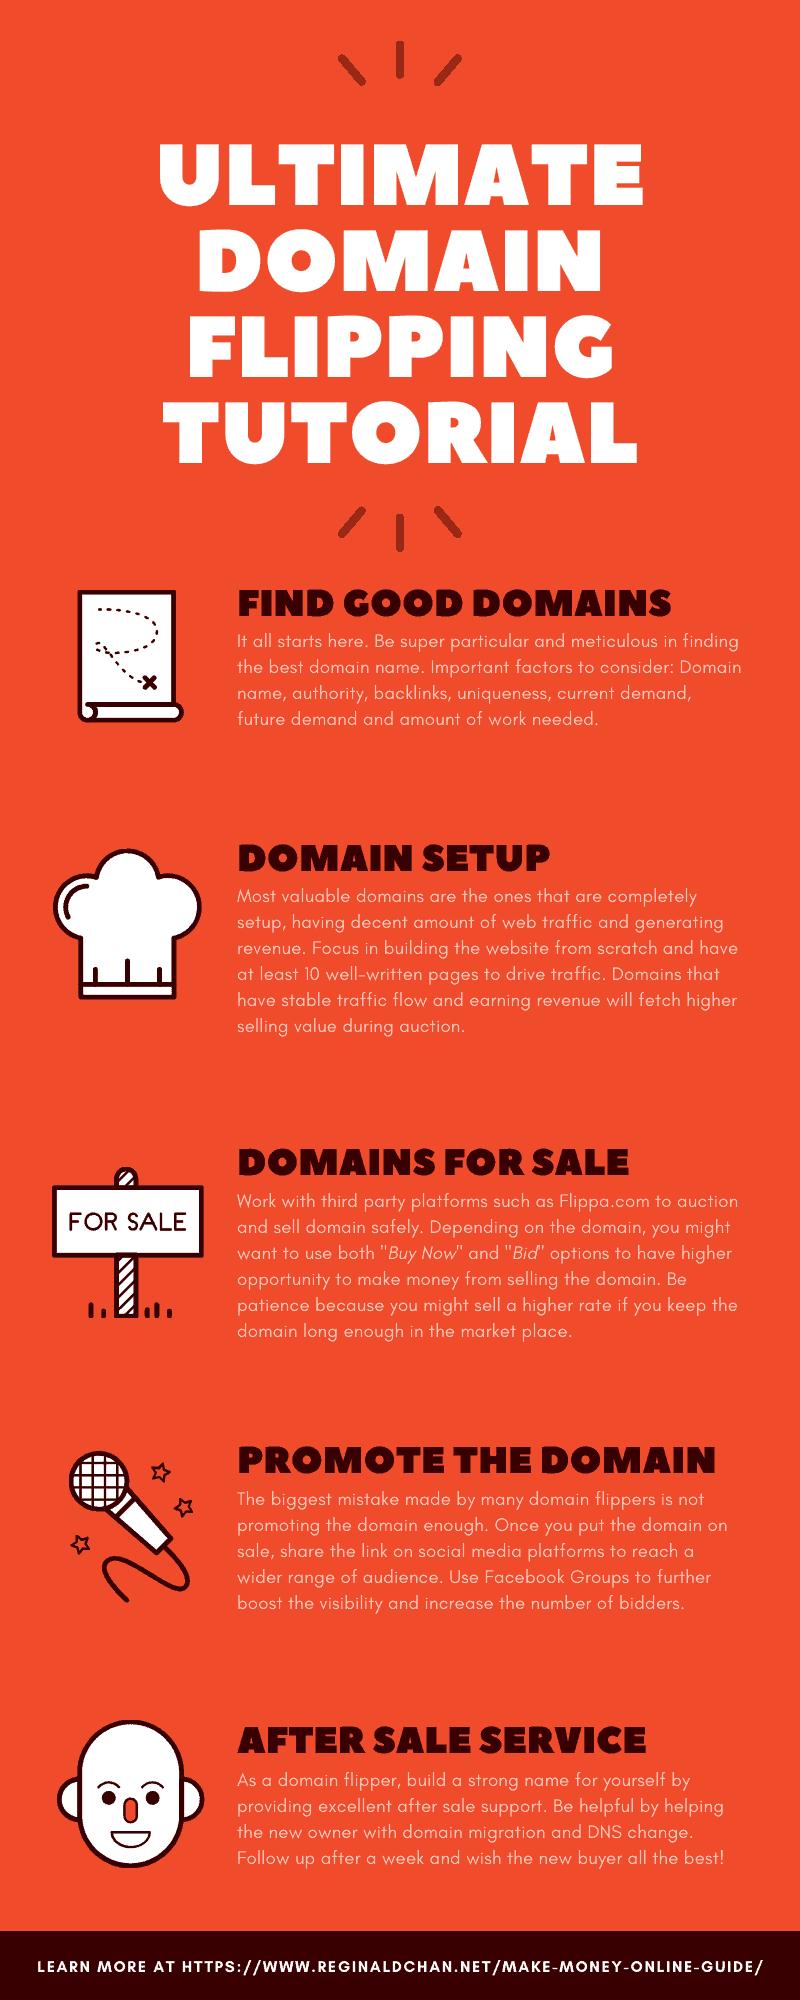 ULTIMATE Domain Flipping Tutorial Make Money Online Guide